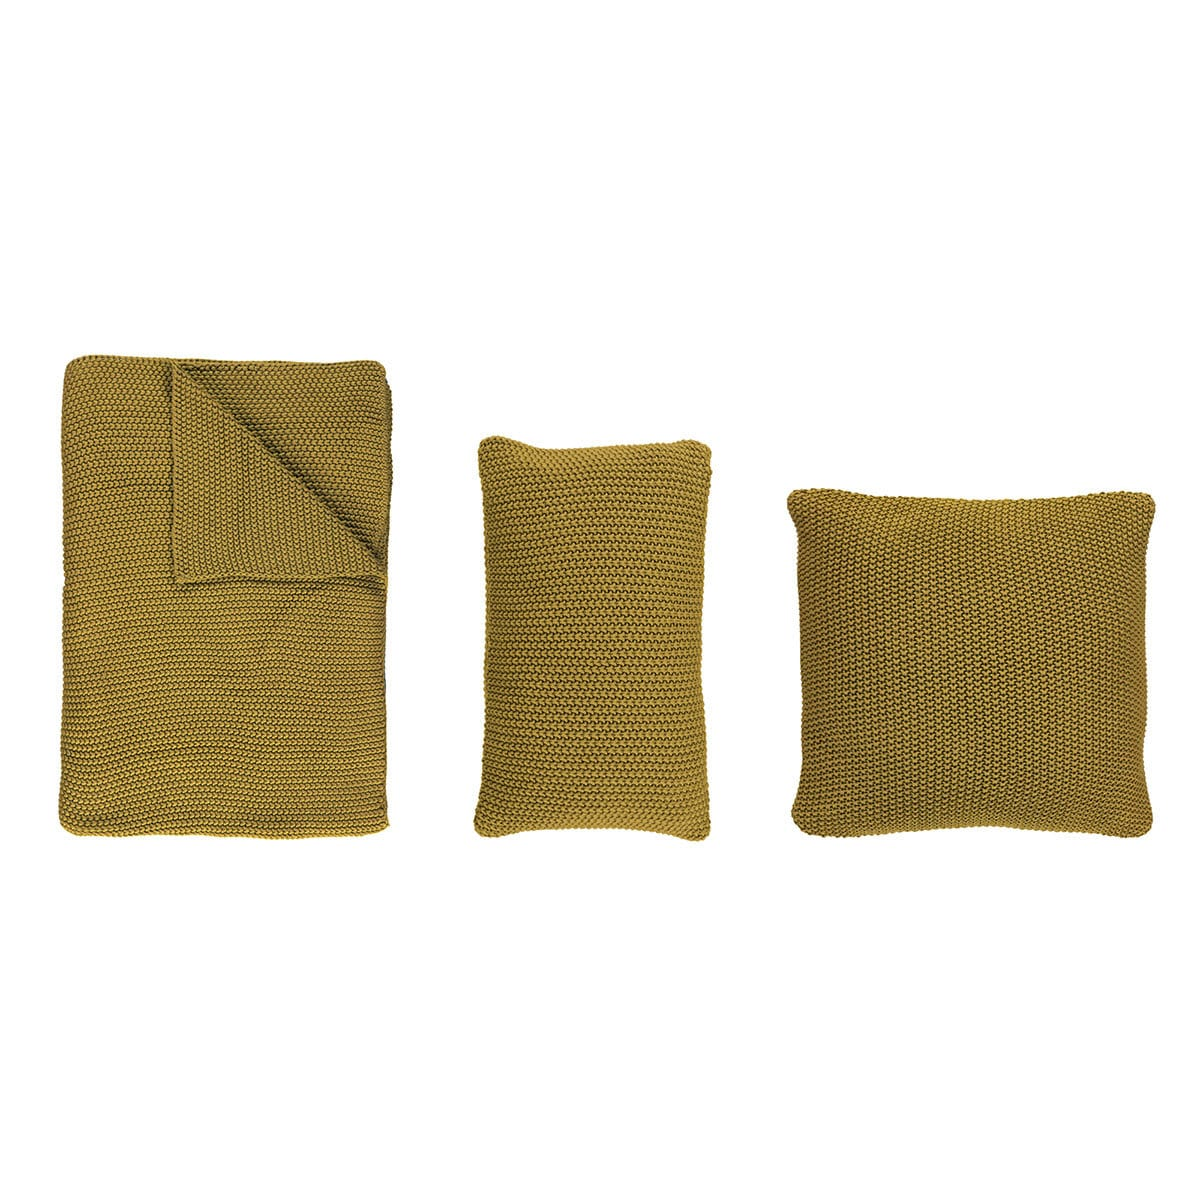 Marc O Polo Strick Dekokissen Plaid Nordic Knit oil yellow